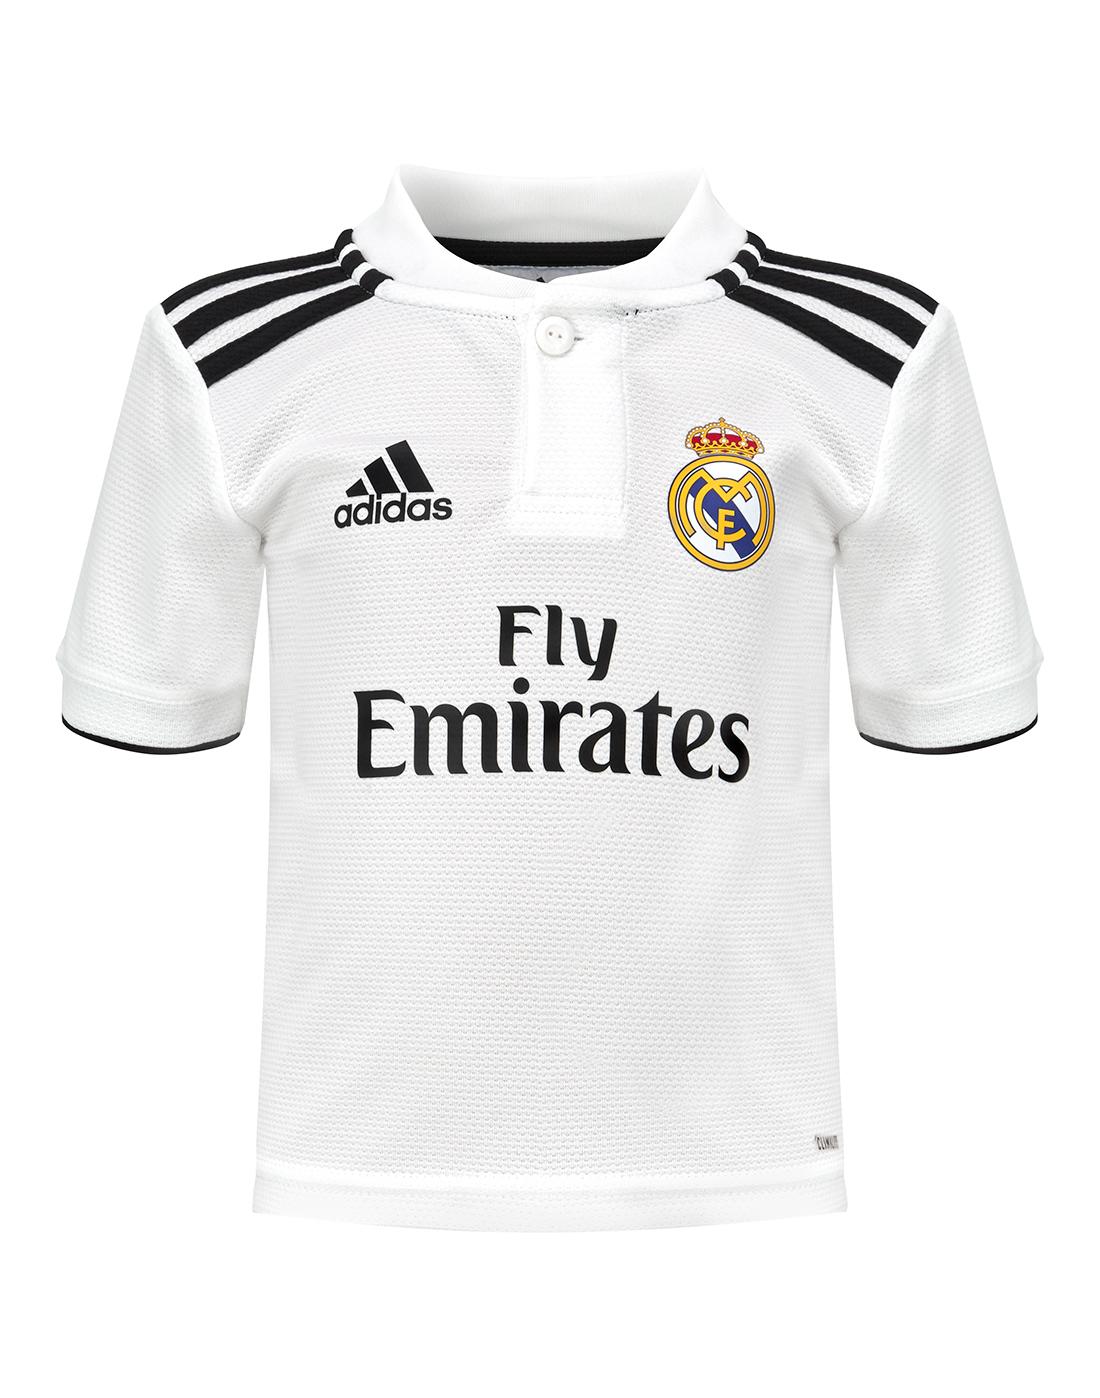 ca54bb5170c07 Kids Real Madrid 18/19 Home Kit | adidas | Life Style Sports